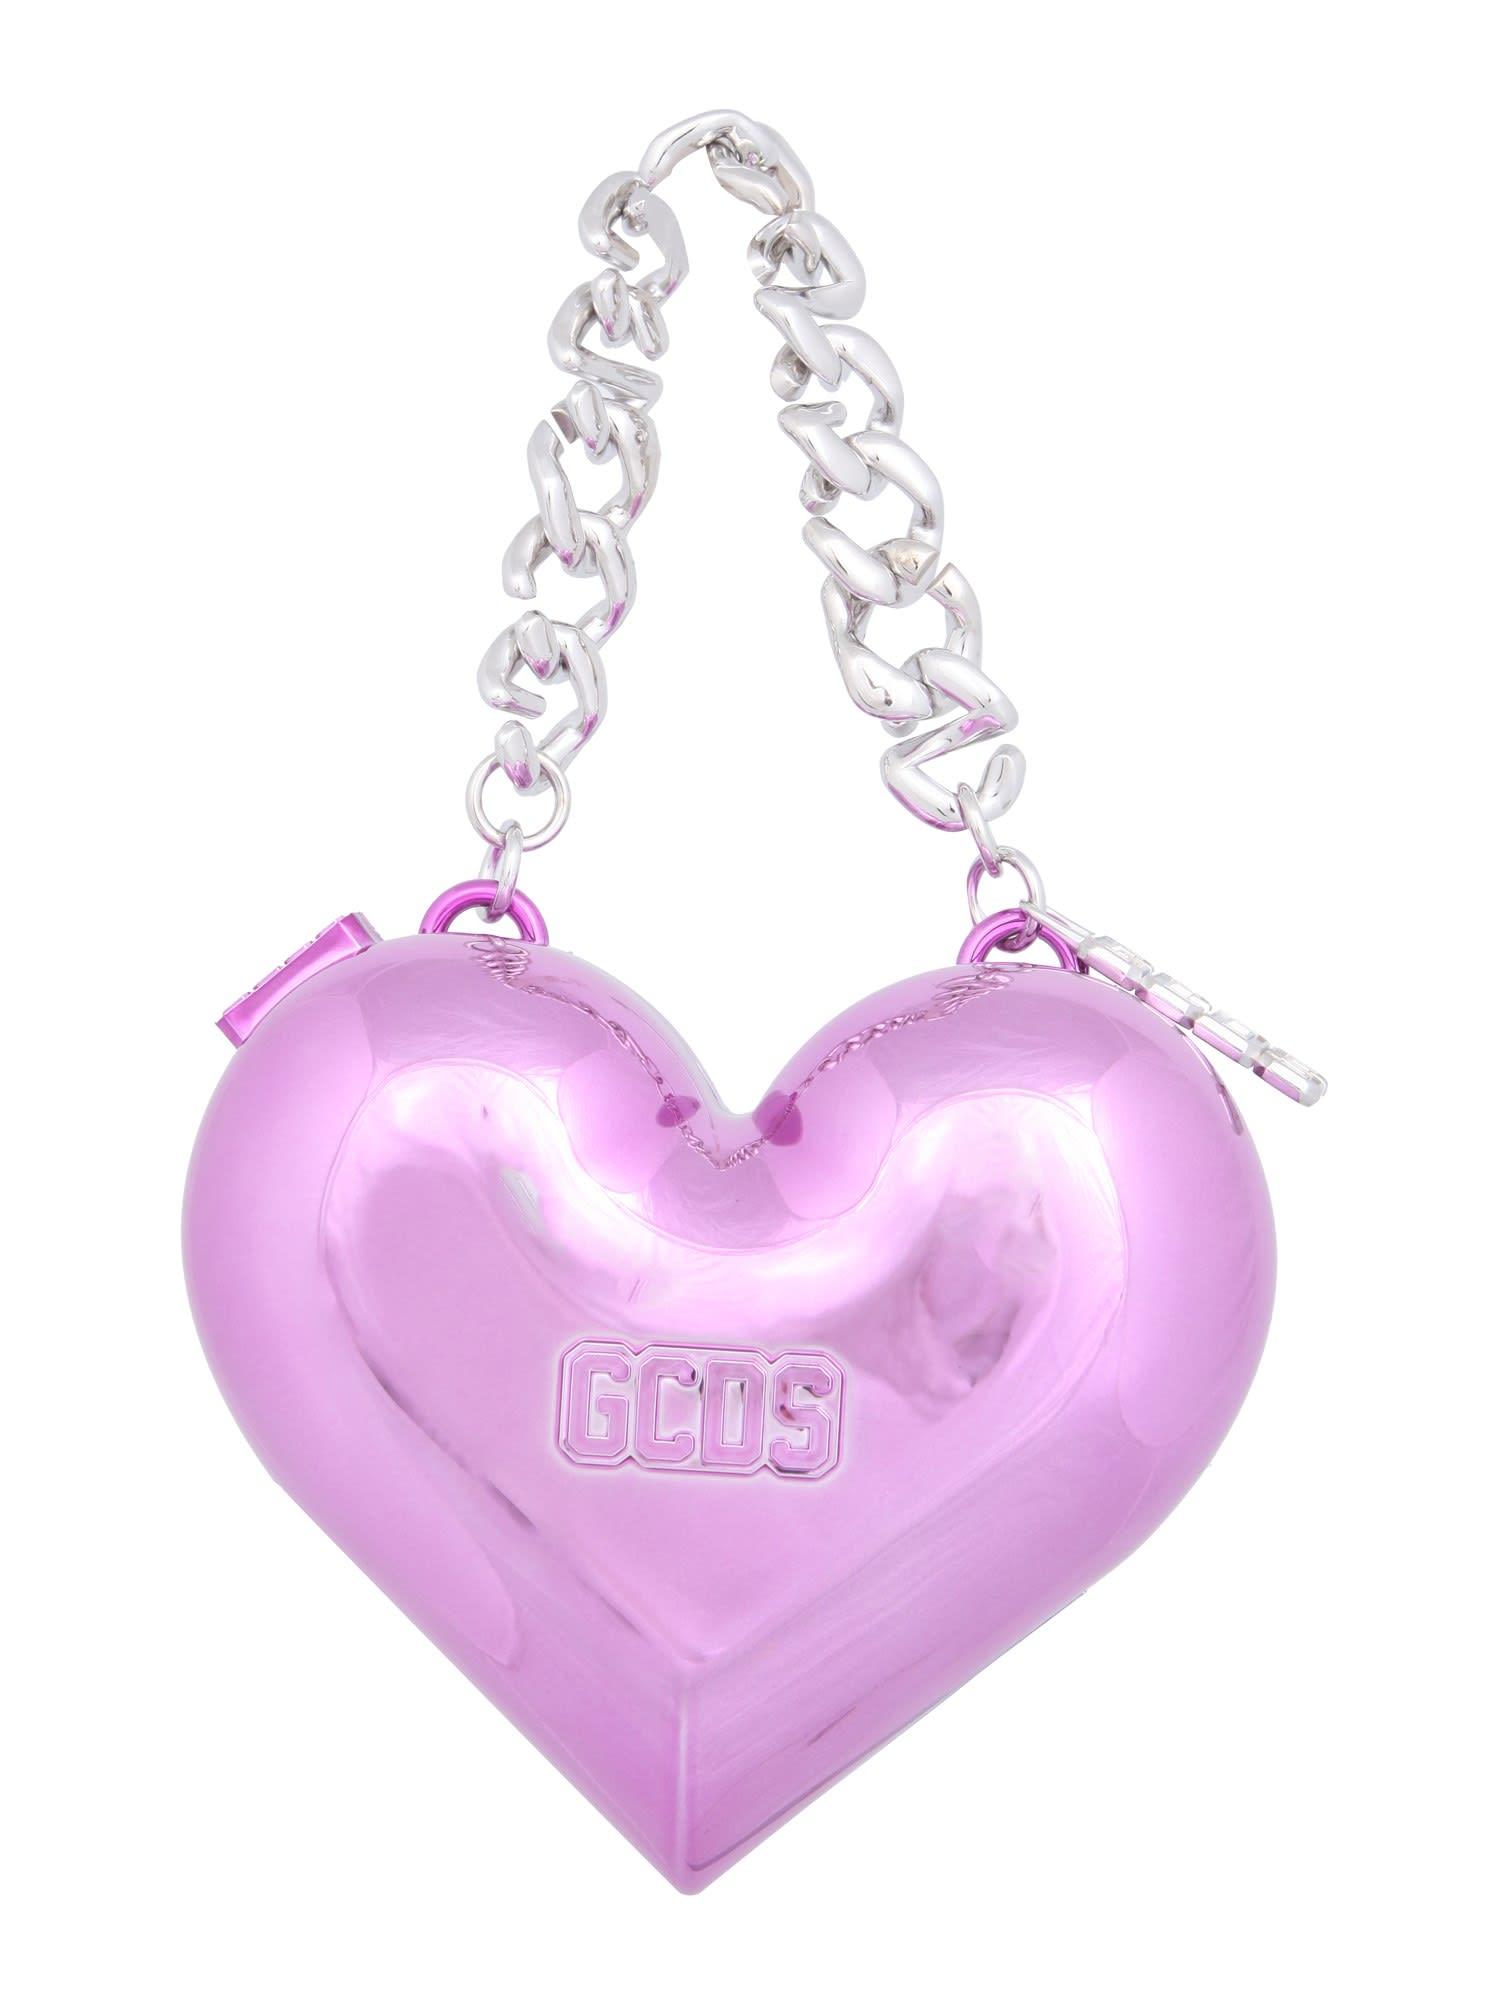 Gcds Clutches HEART BAG